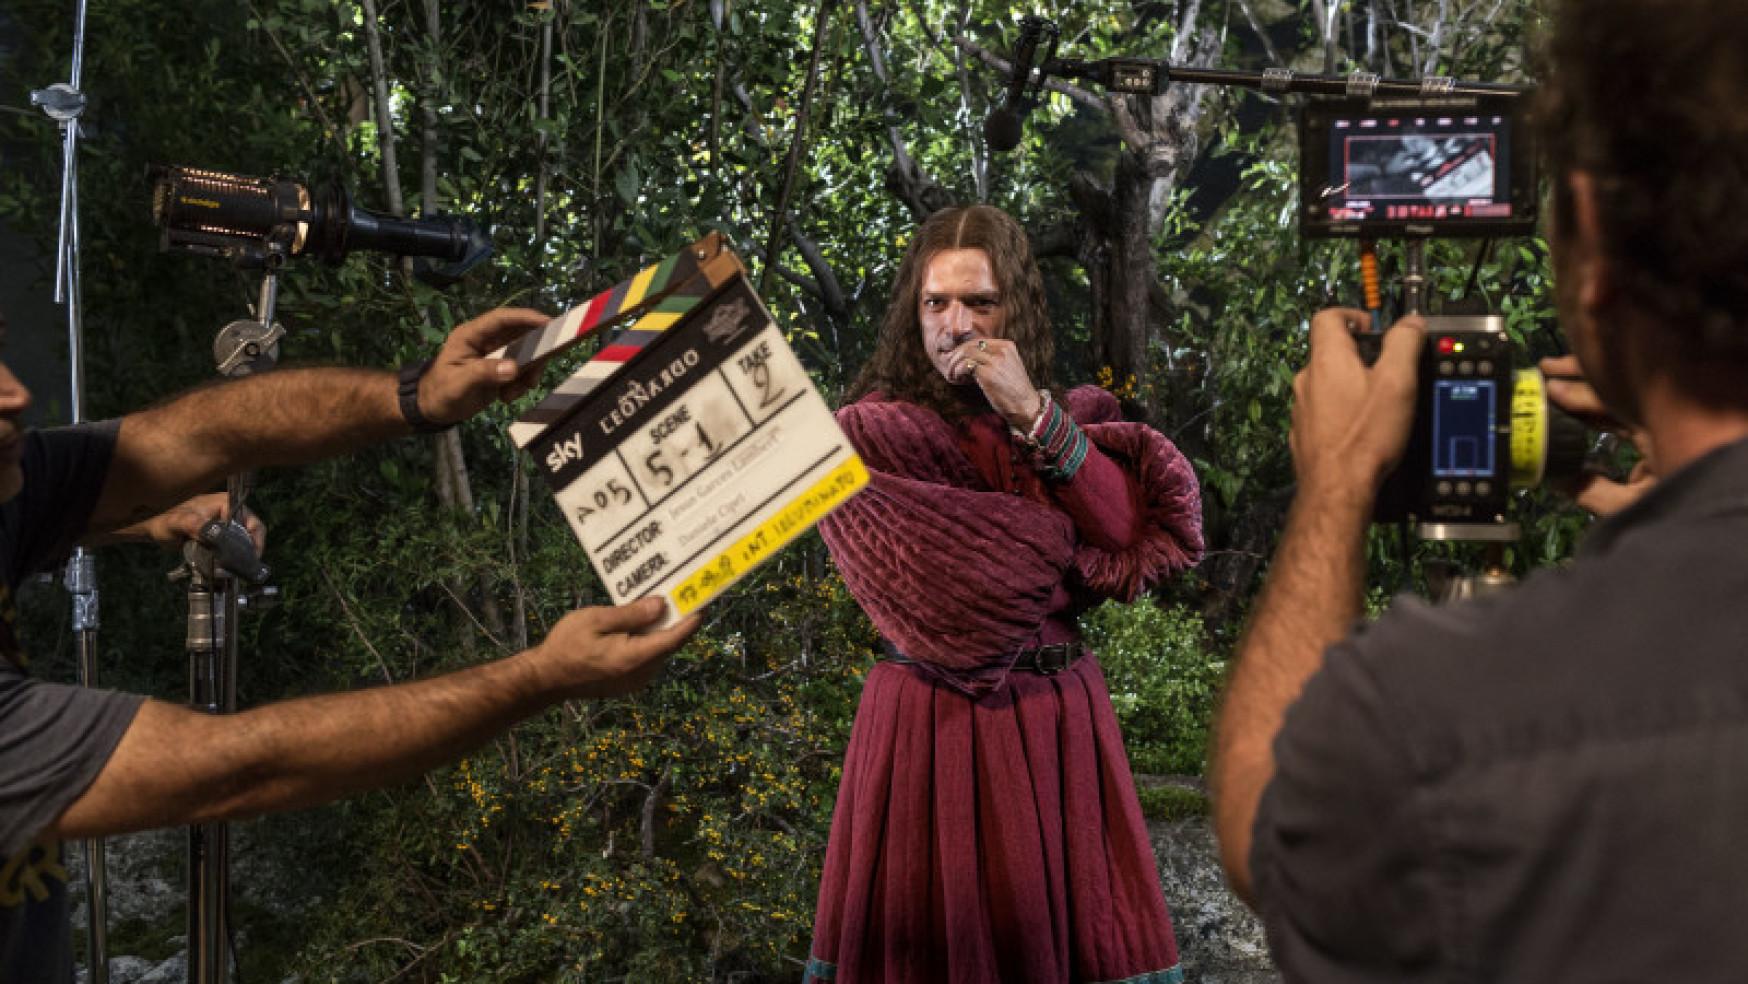 GENIO LEONARDO FILM IN TV SU SKY CINEMA E SKY ARTE